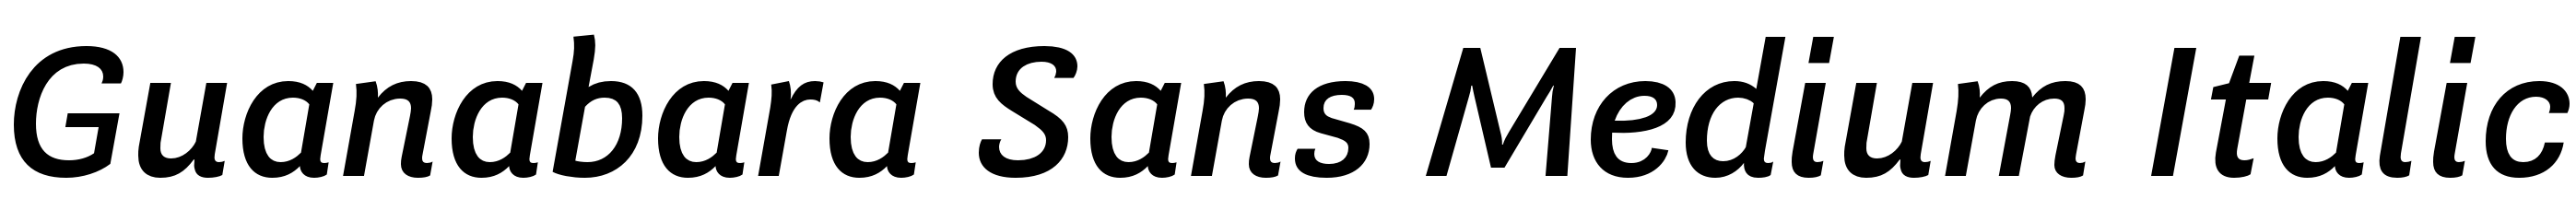 Guanabara Sans Medium Italic